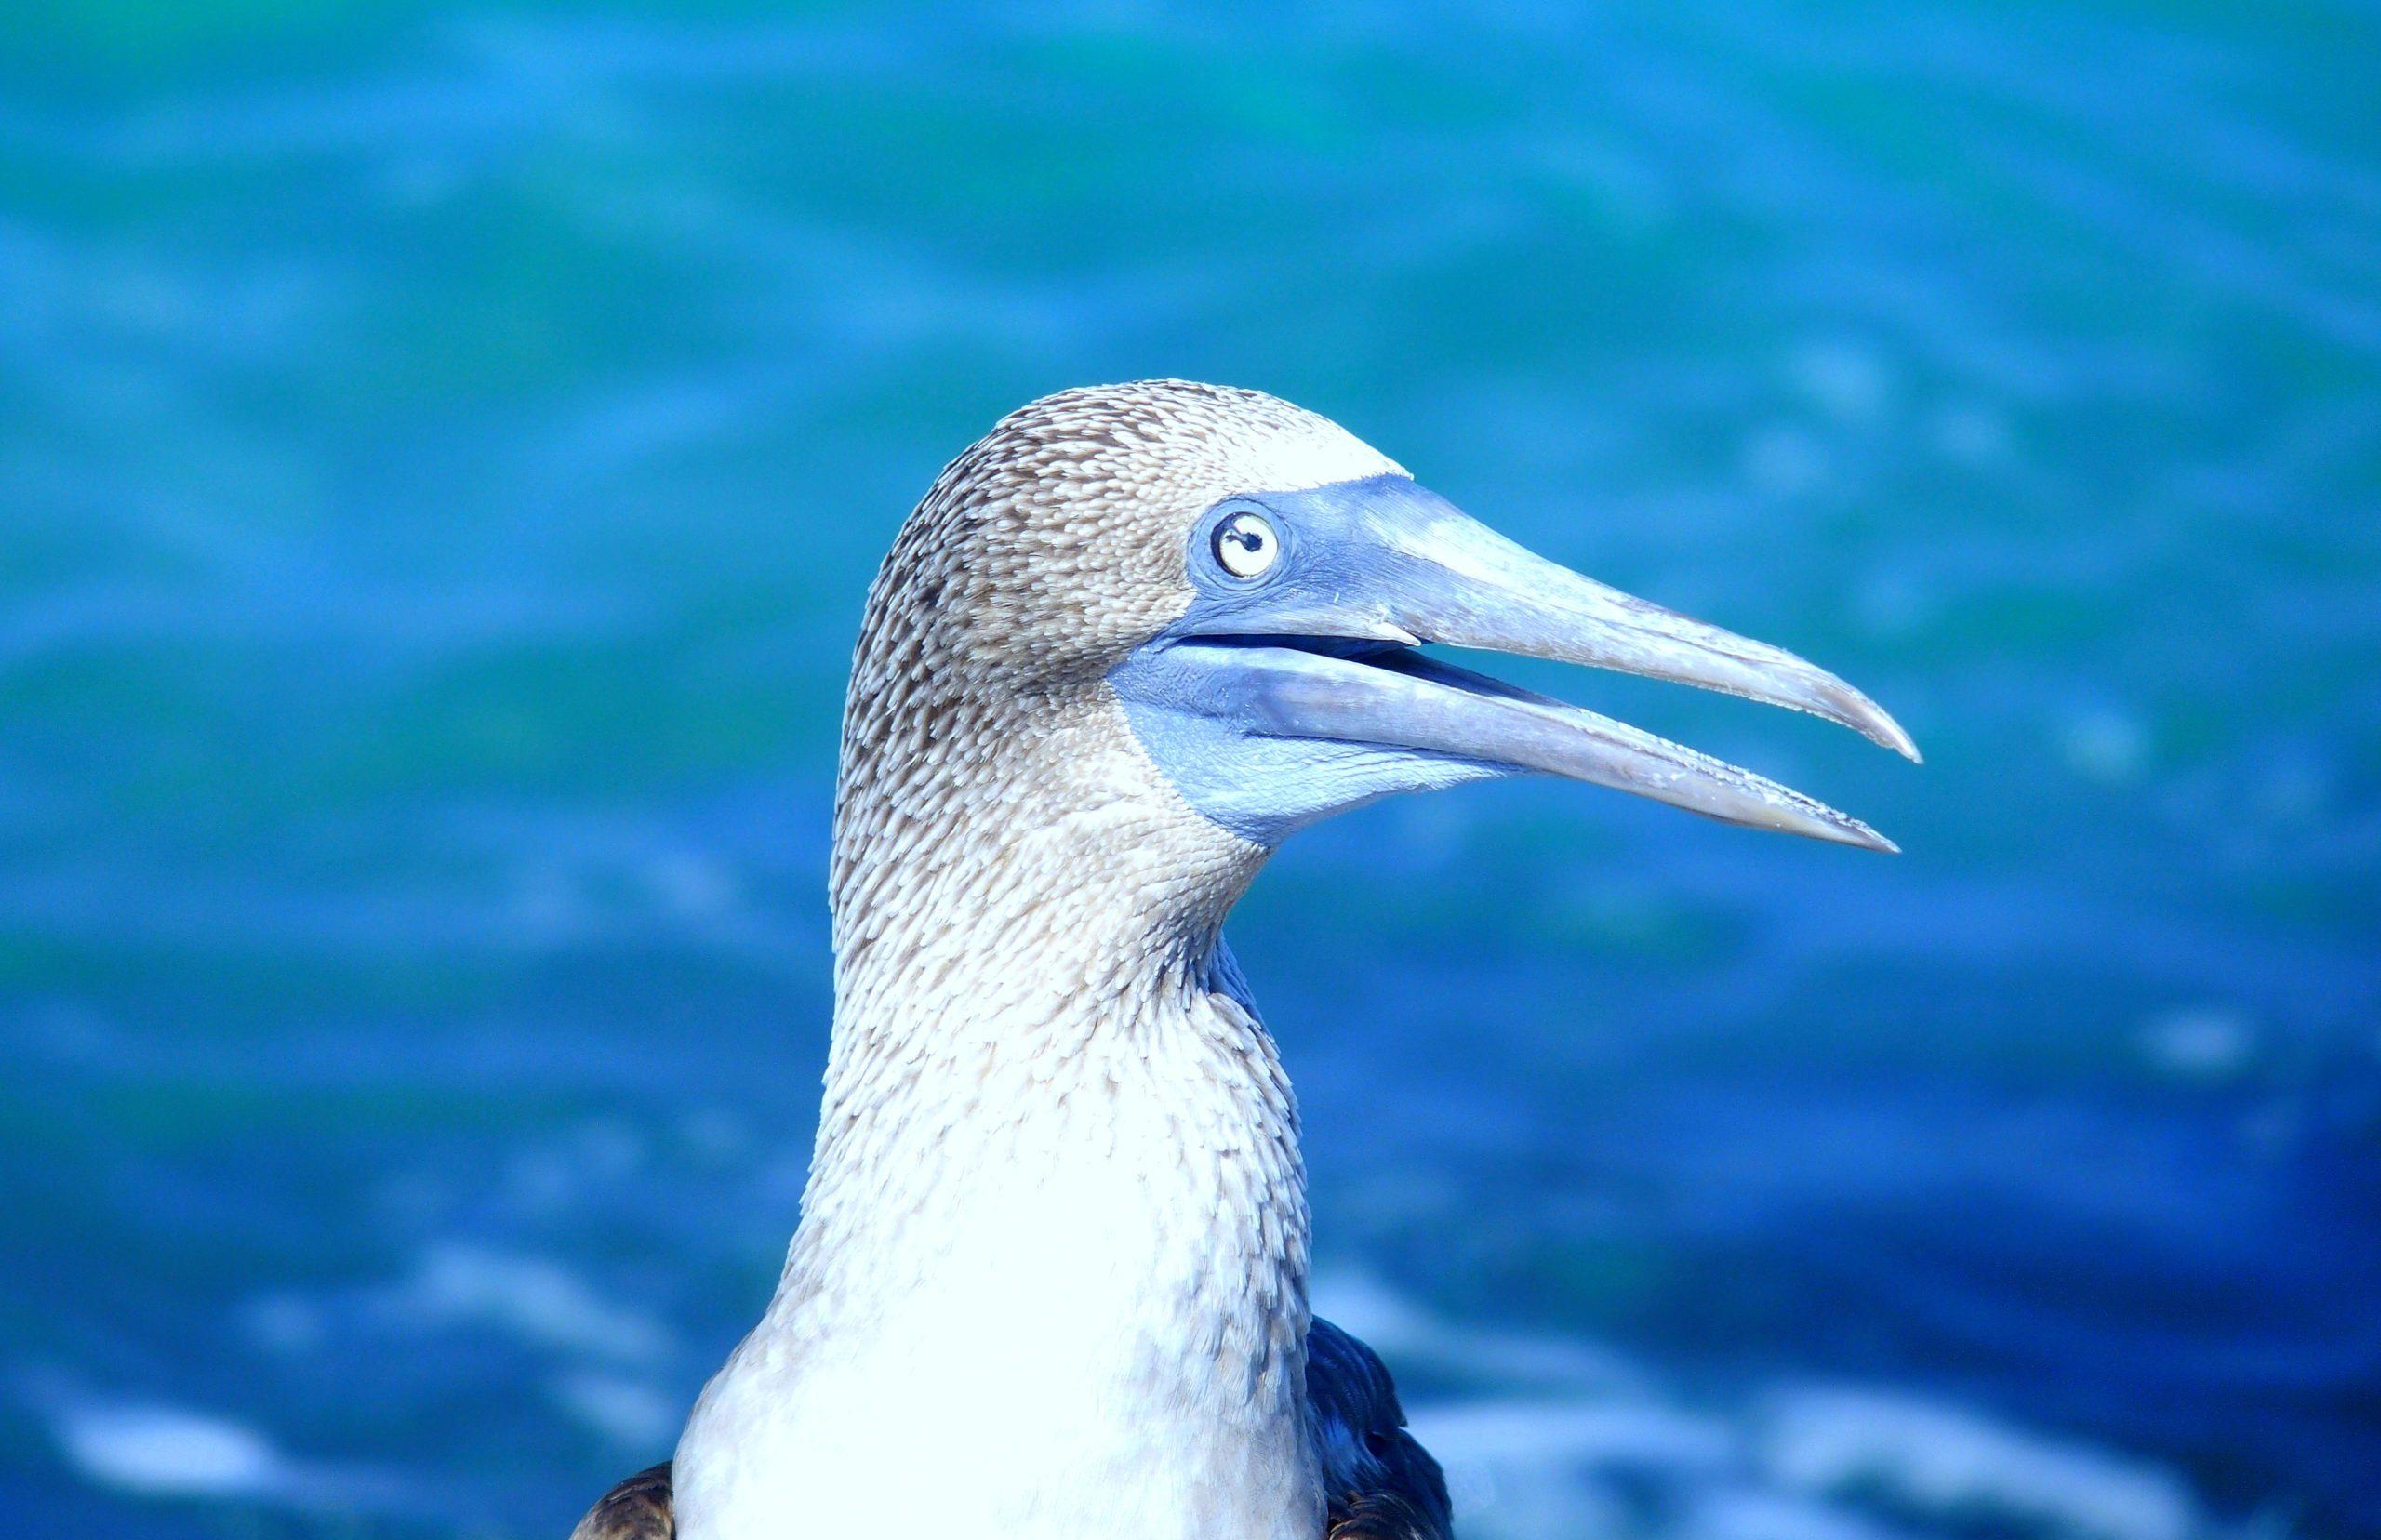 Bec bleu d'un fou à pattes bleues île San Critobal Galapagos